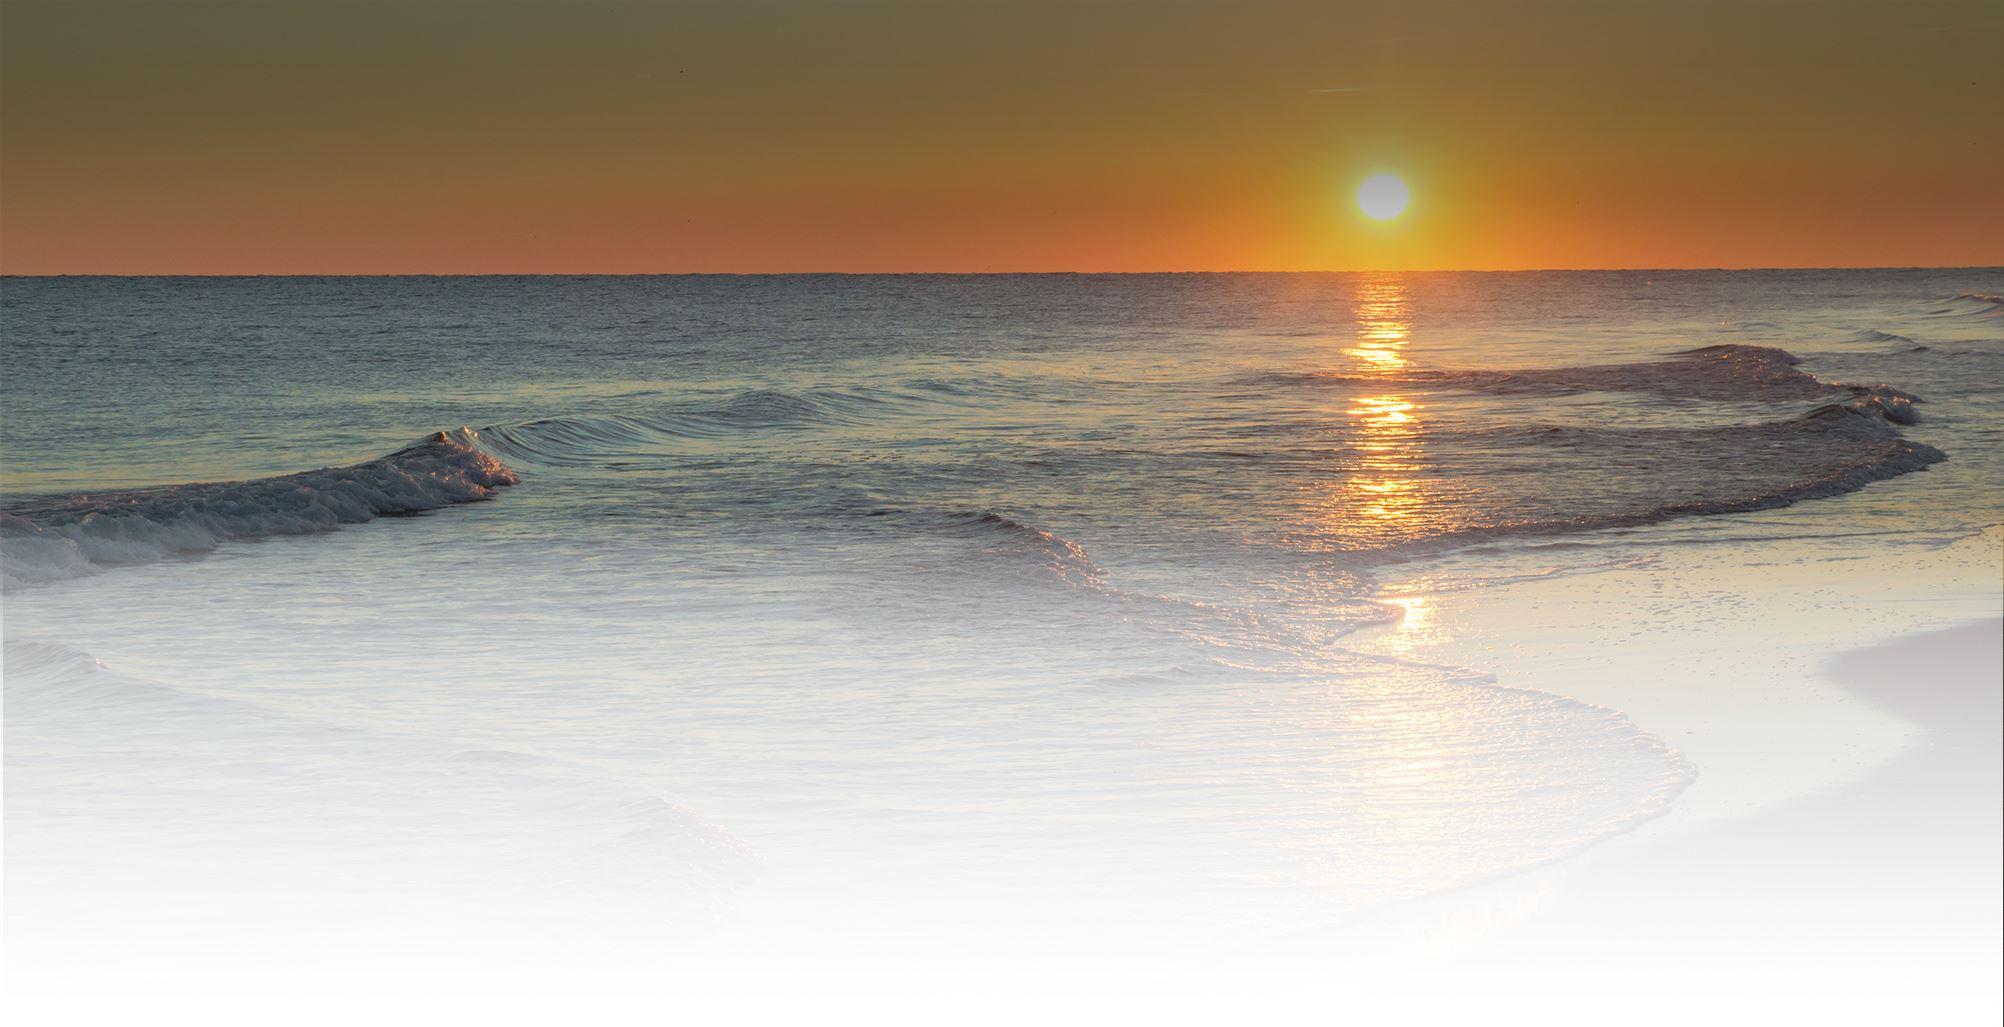 Gulf Shores, AL - Official Website | Official Website